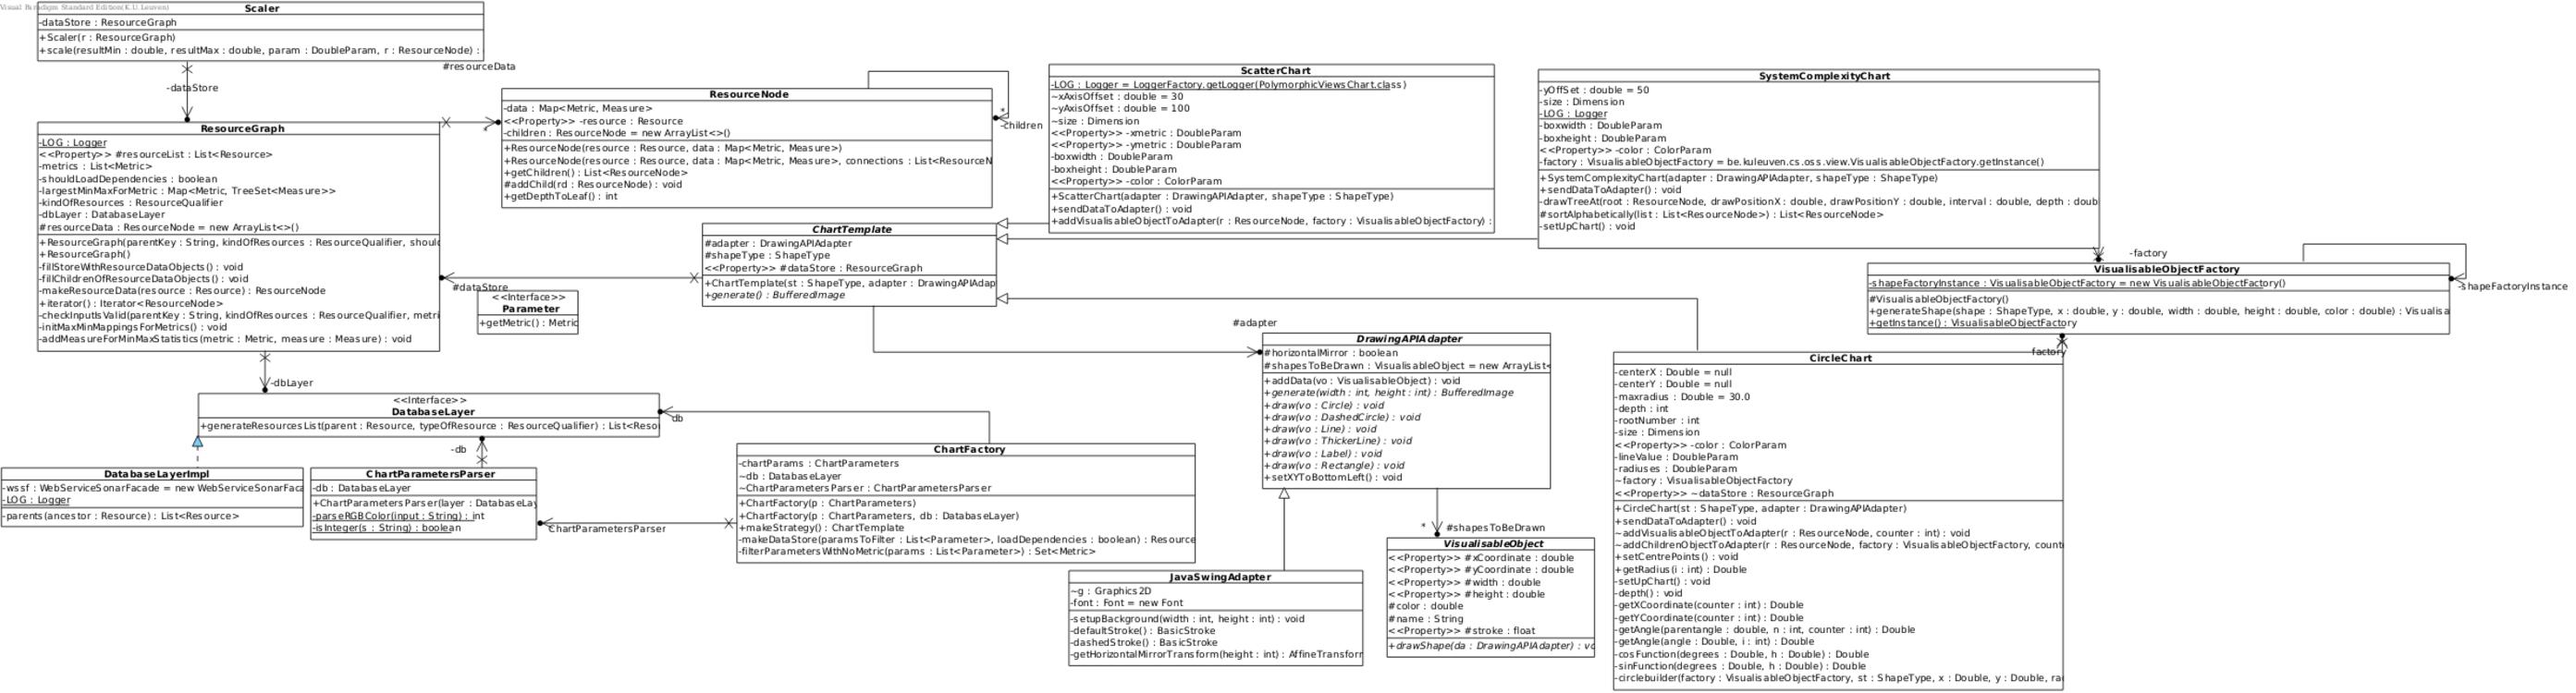 Document,Angle,Screenshot